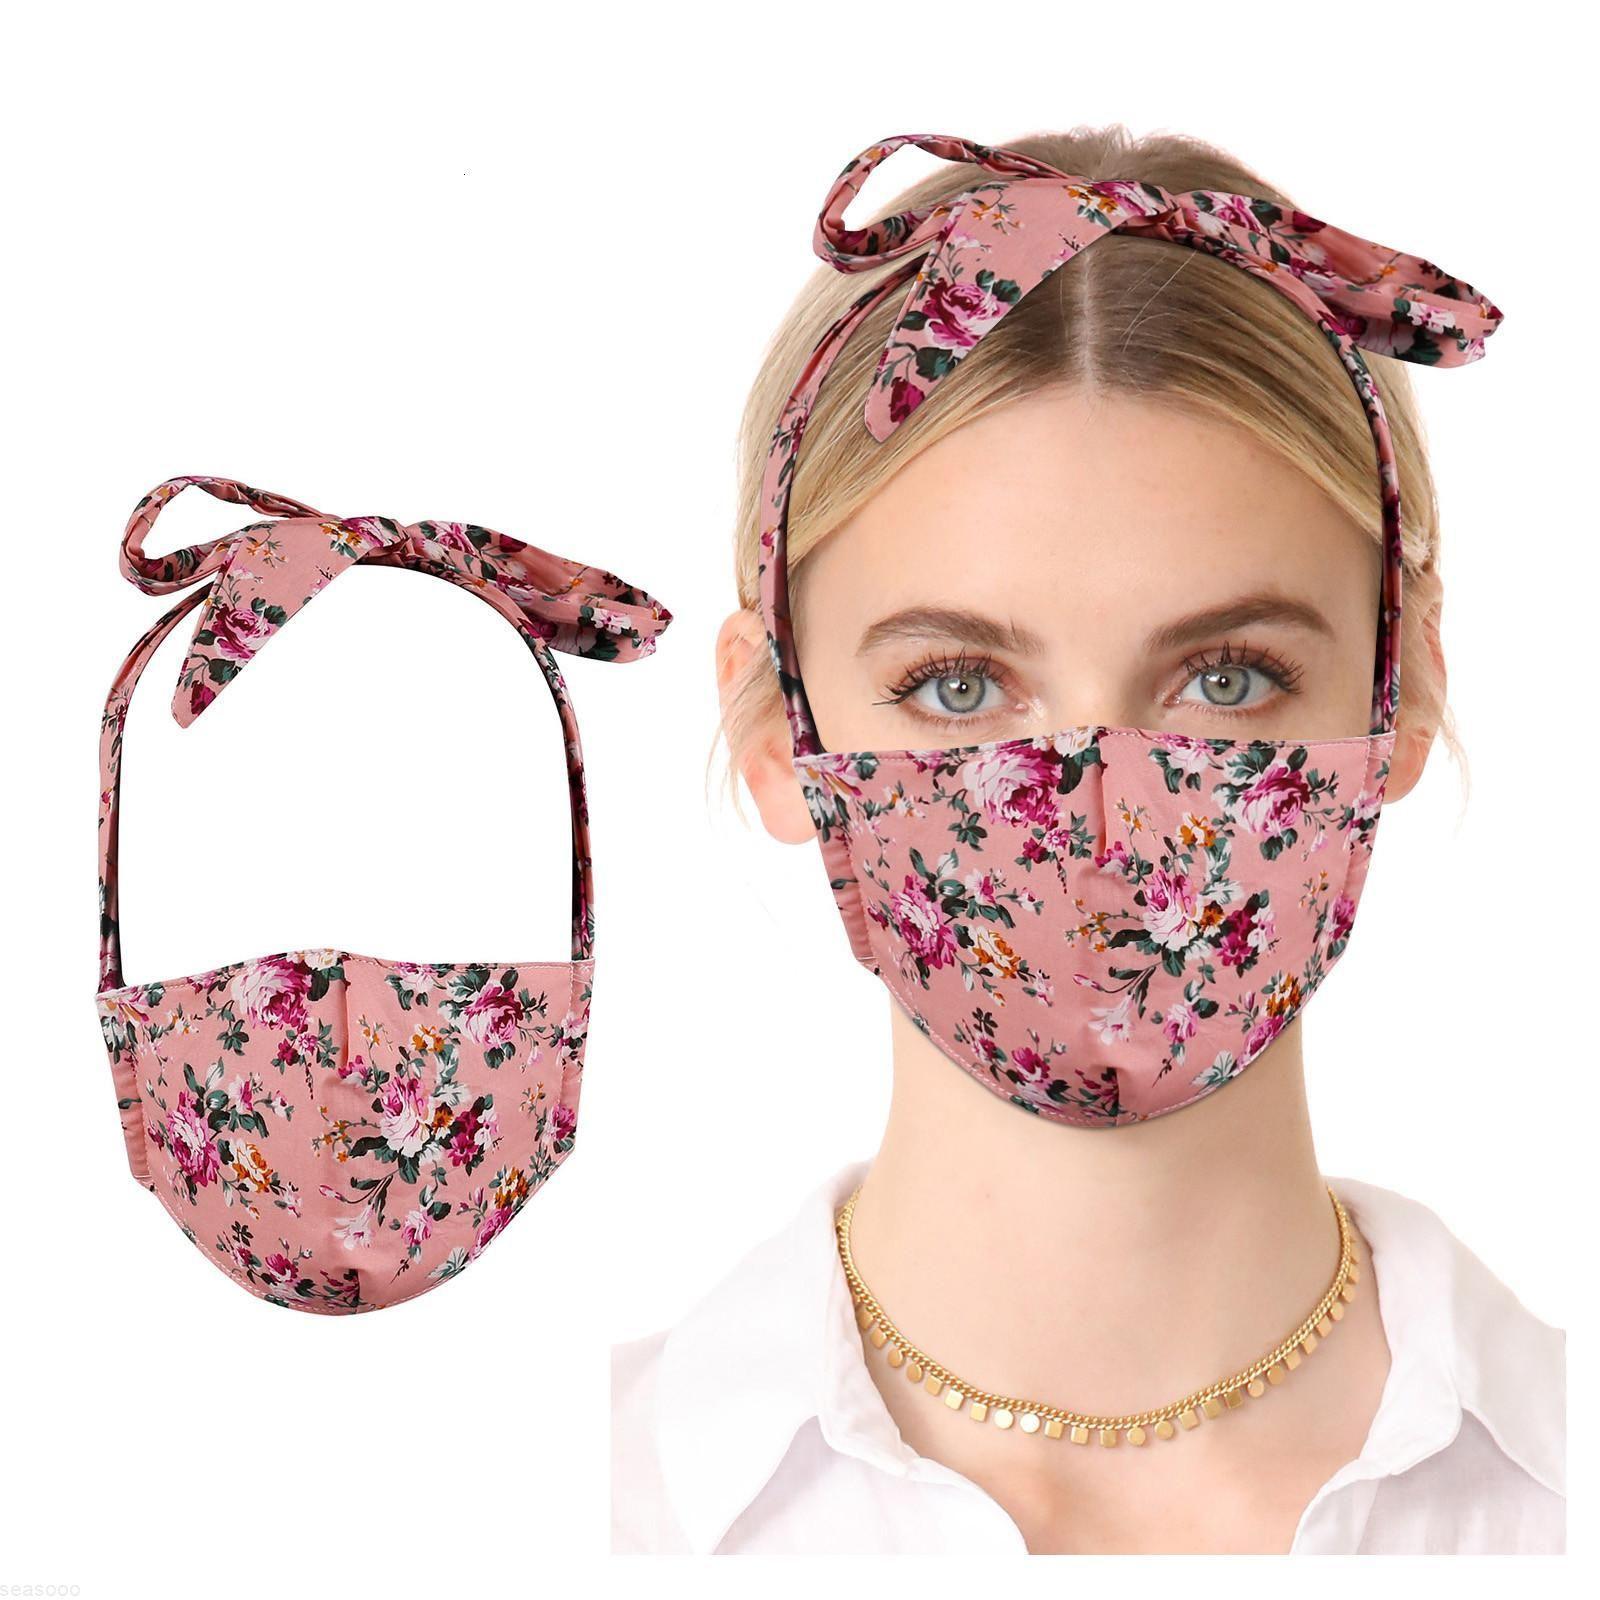 Máscara de dibujos animados Moda para adultos Mascarillas de algodón de algodón de algodón Dot con diadema reutilizable Lavable Boca Cubiertas Bufanda de tela Masque Jllwkw xjfshop